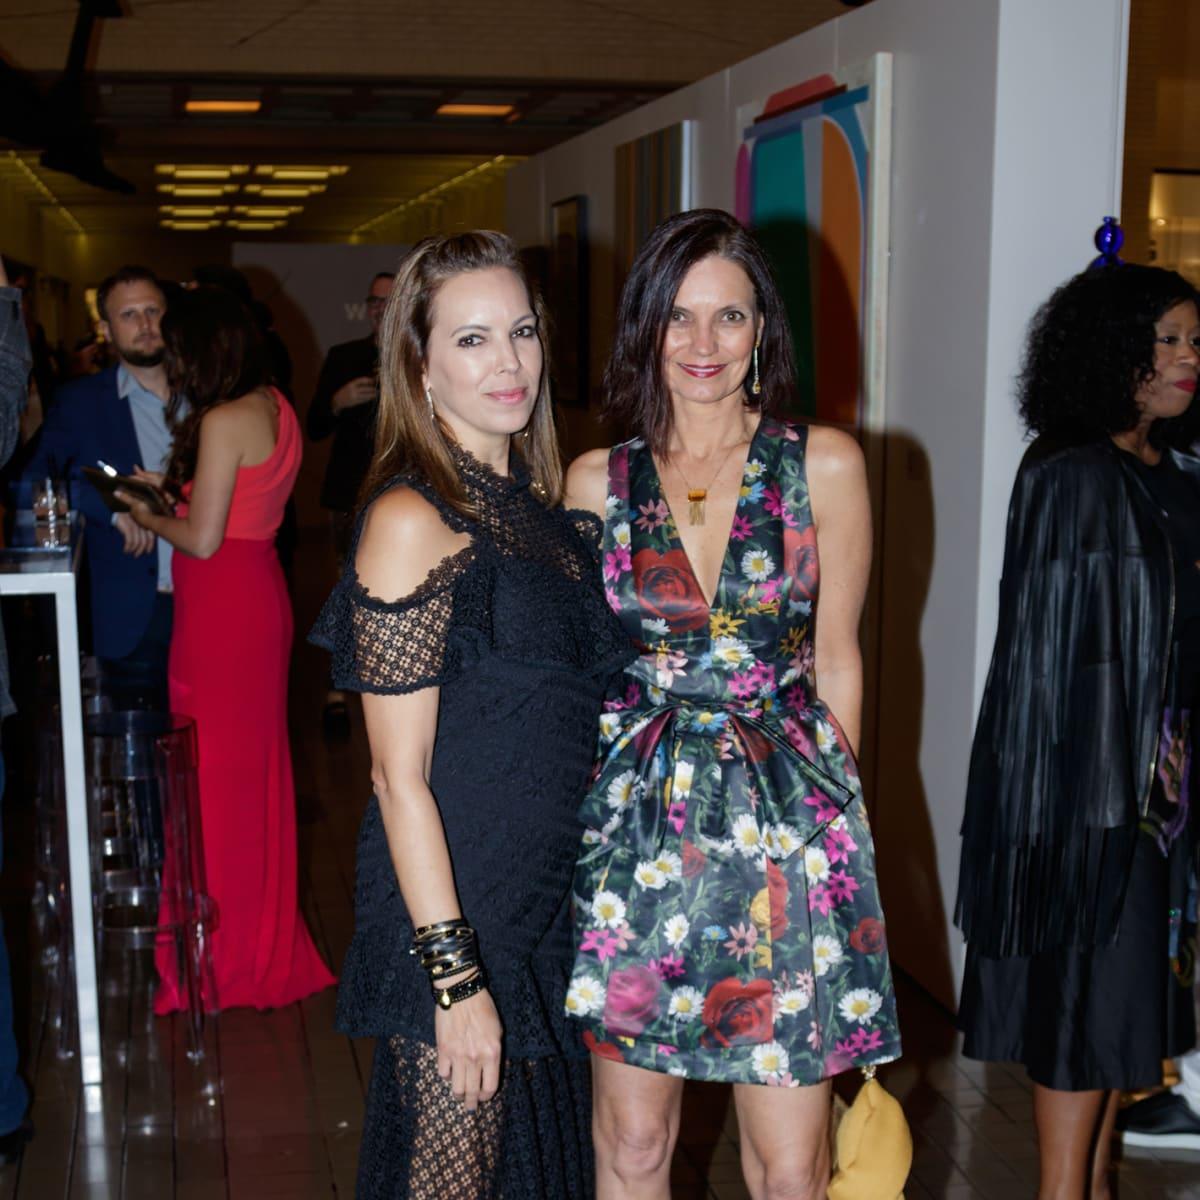 Melissa Enriquez, Lucrecia Waggoner